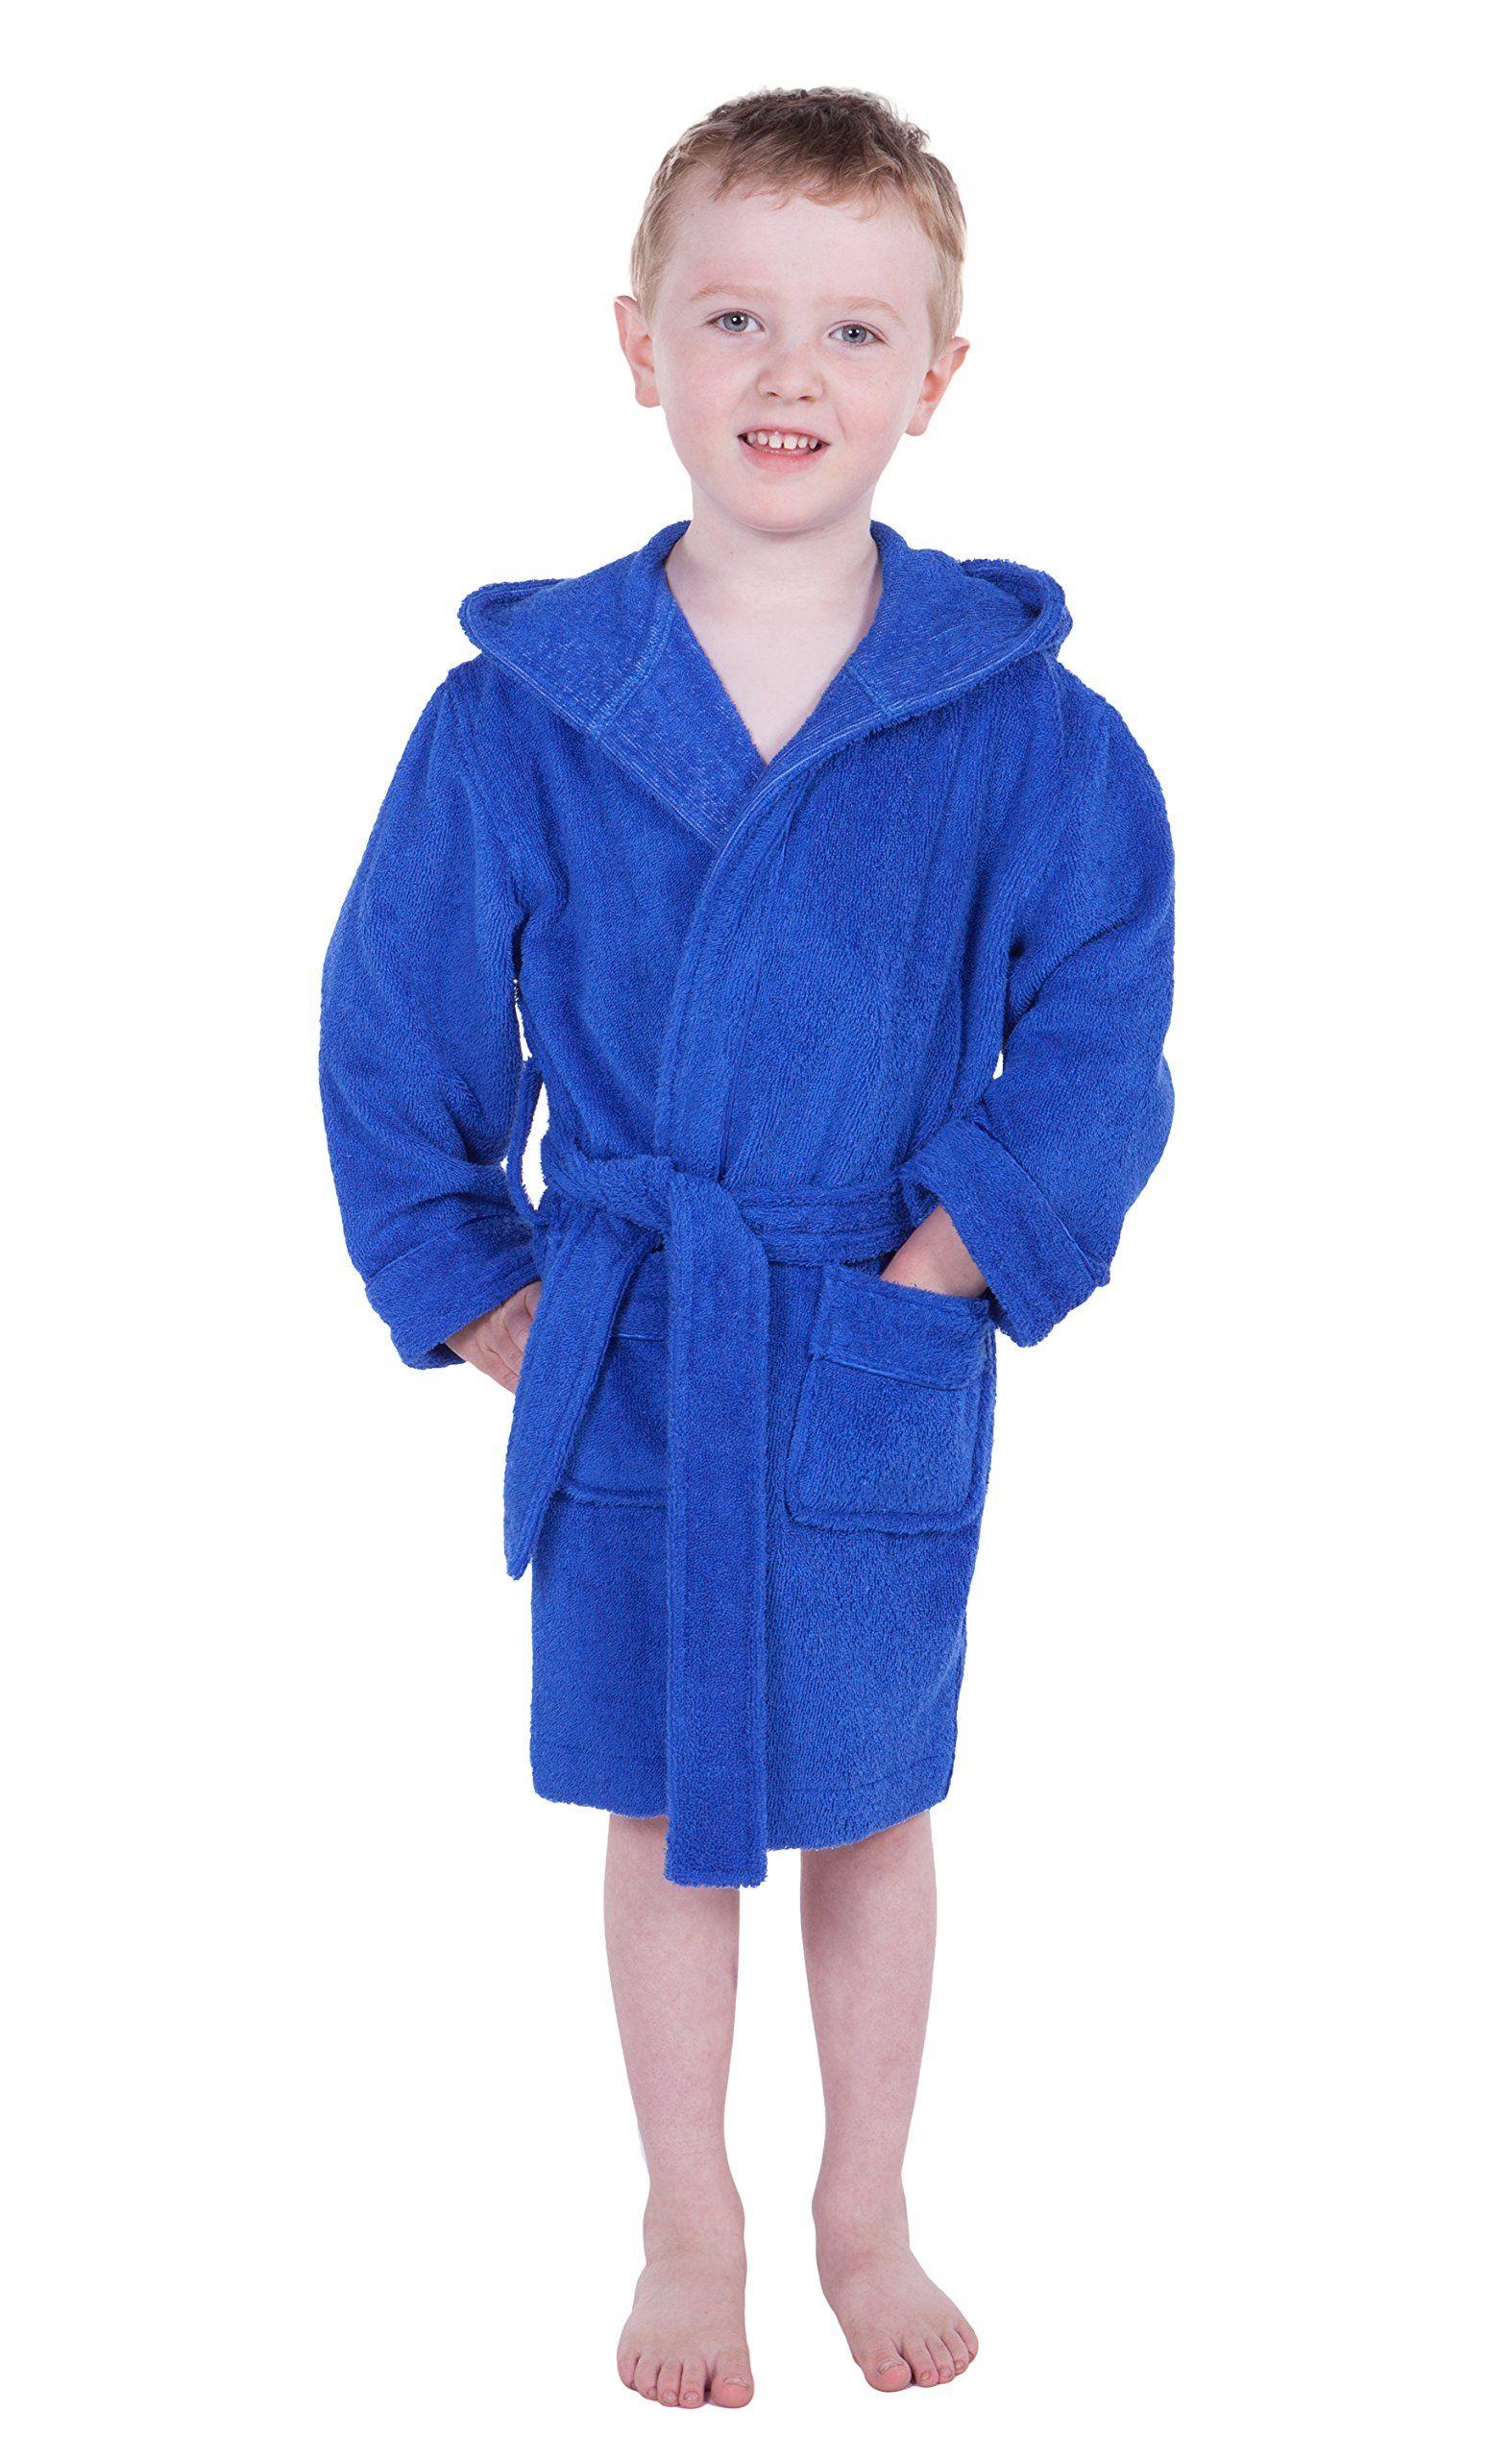 Rub-A-Dub Kids Hooded Terry Cloth Bathrobe Cozy Robe by for Kids Texere